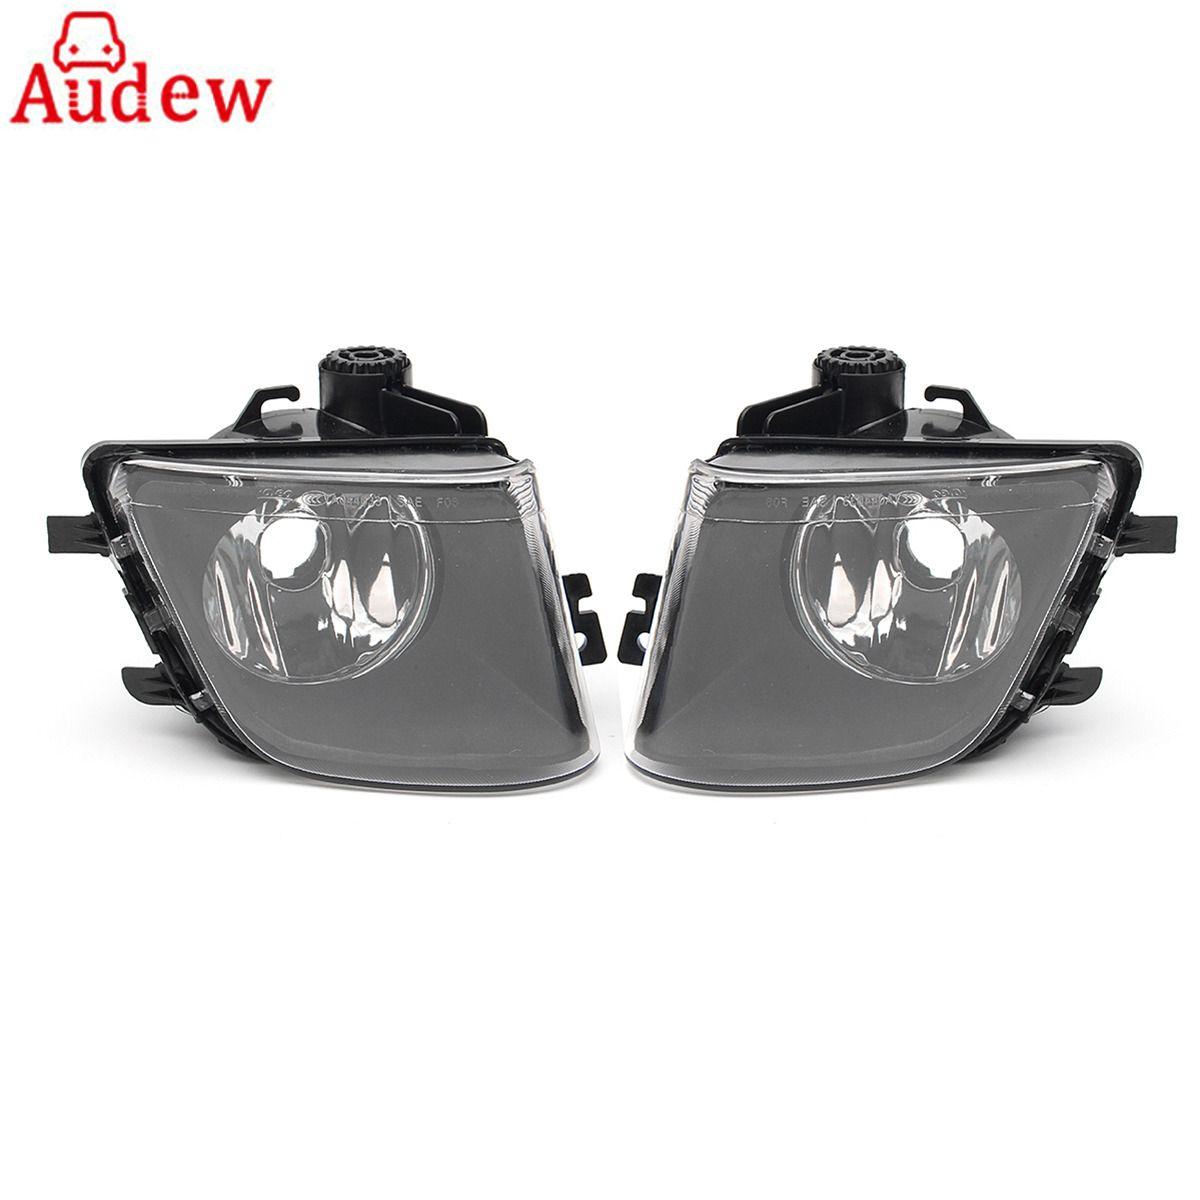 Für BMW F01 F02 740i 740Li 750i 2009-2013 1 Paar Nebel Fahr Licht Klare Linse Links & Rechts